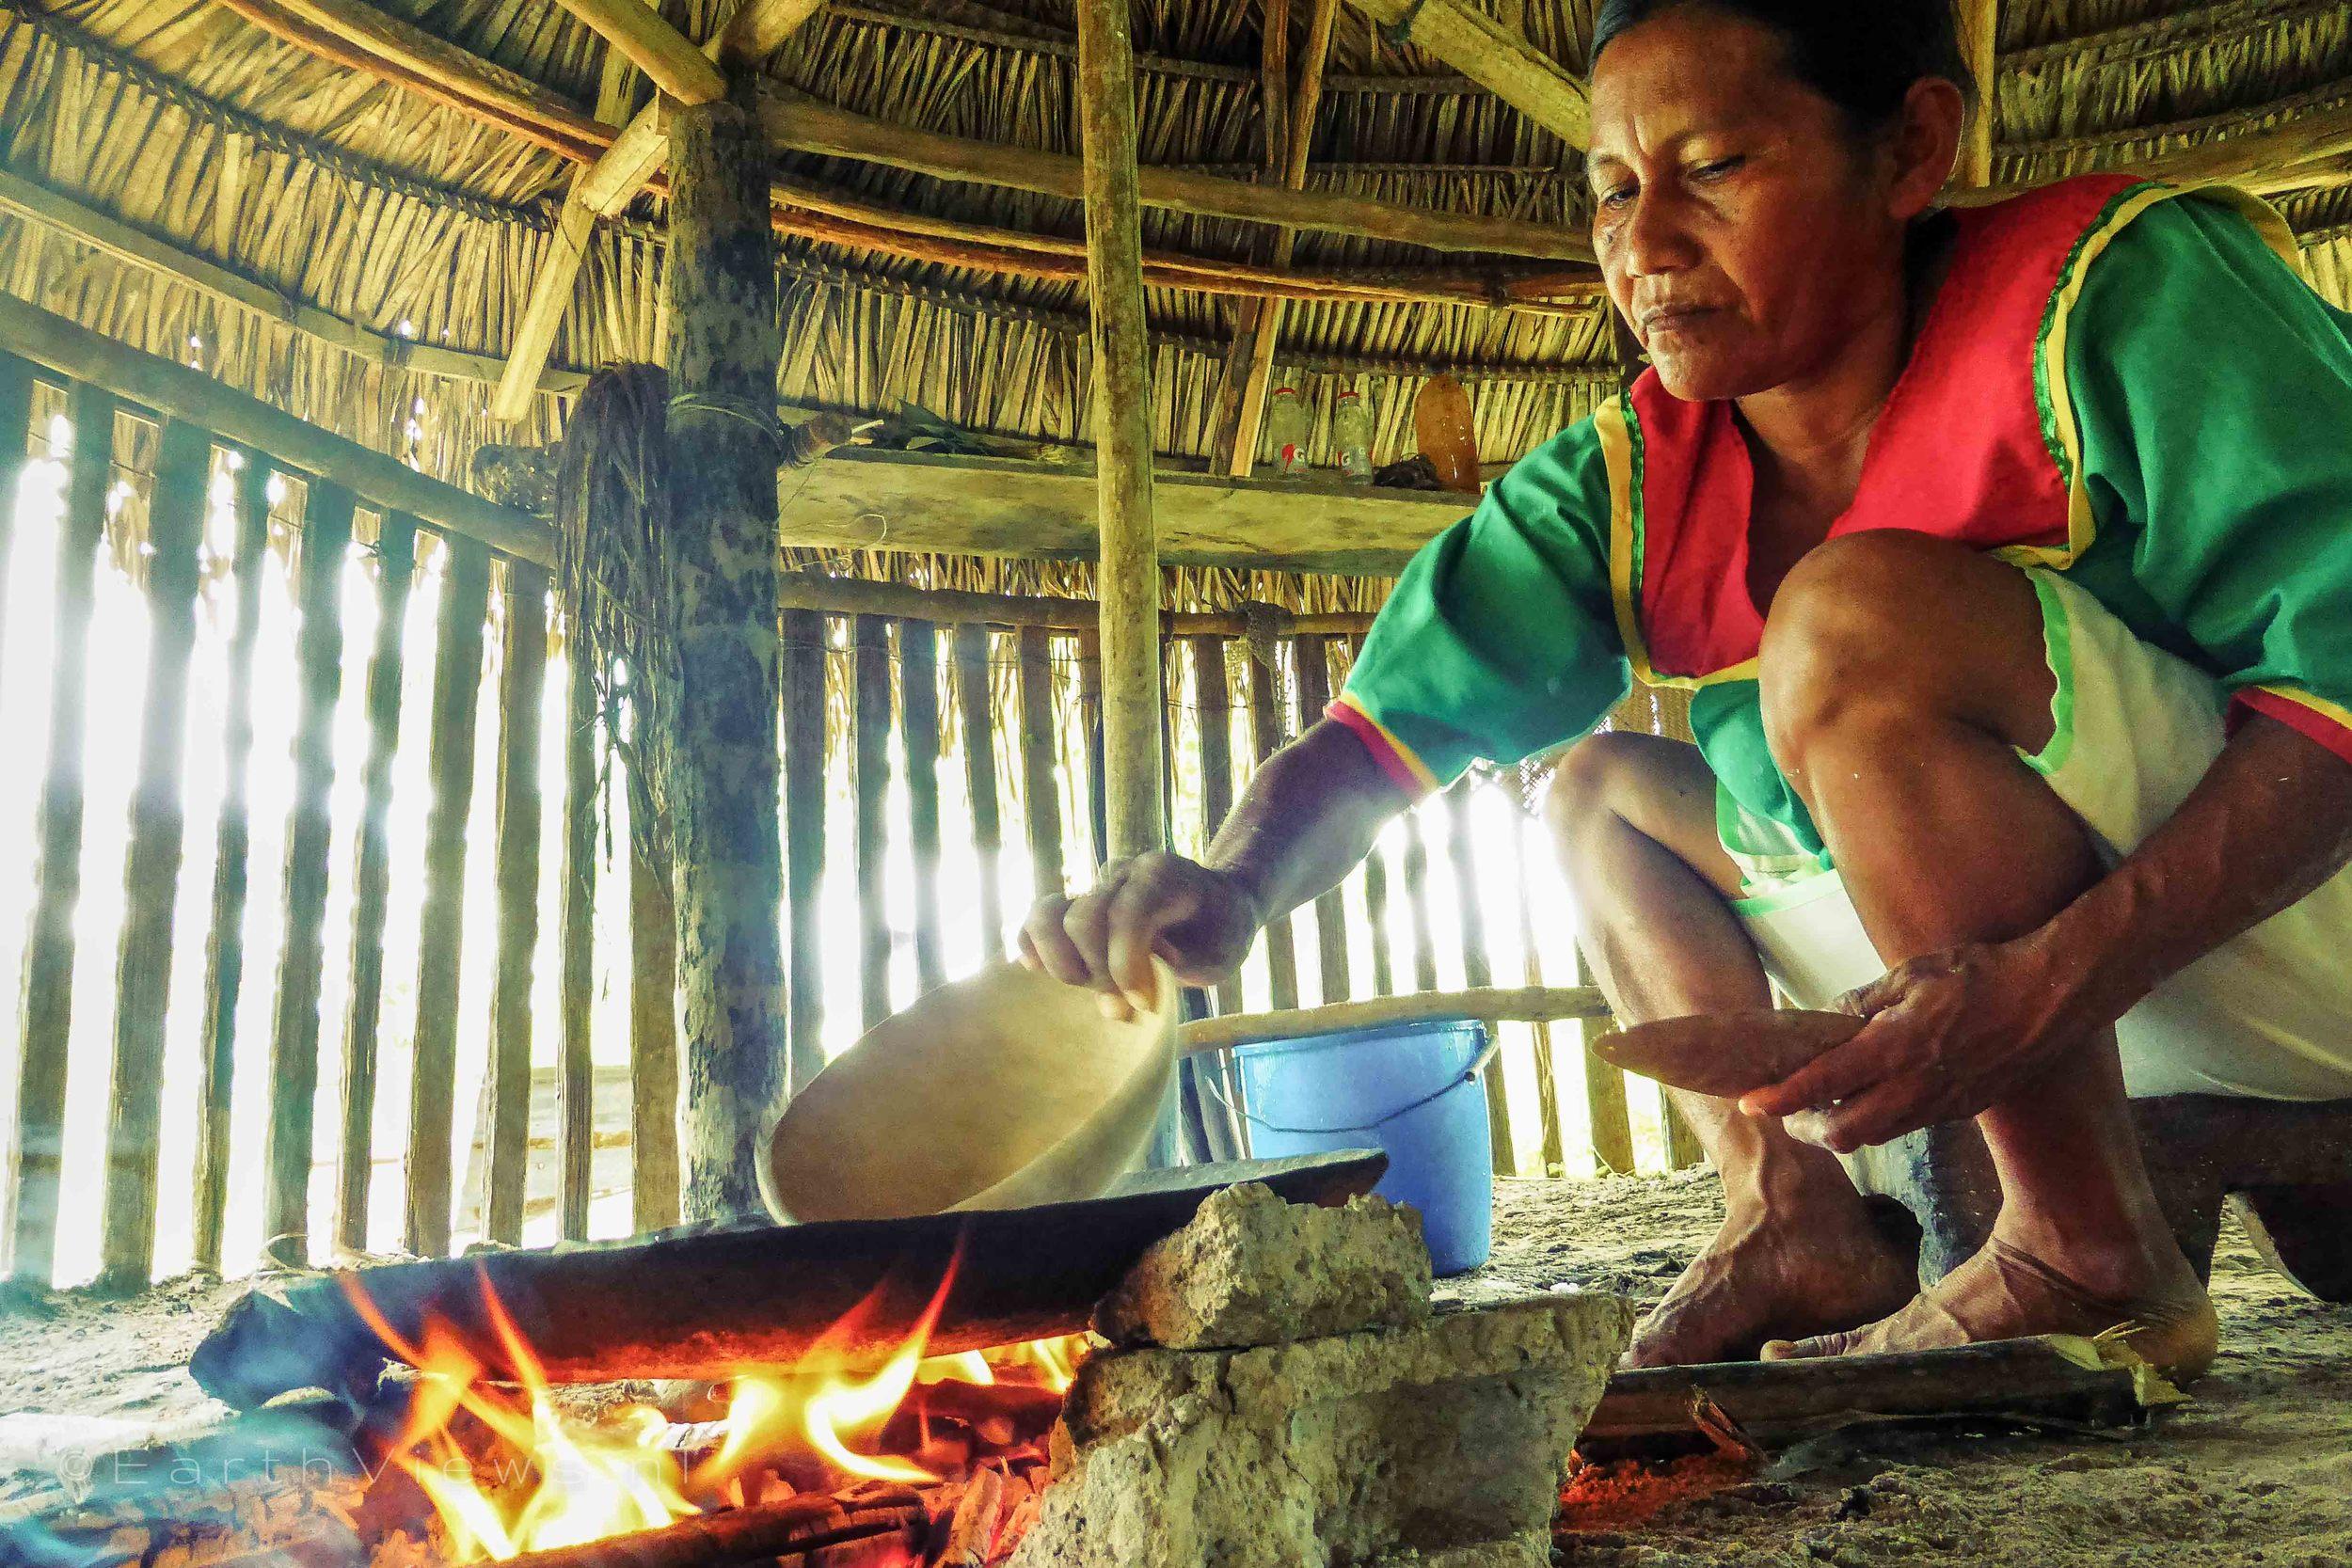 Baking the bread.